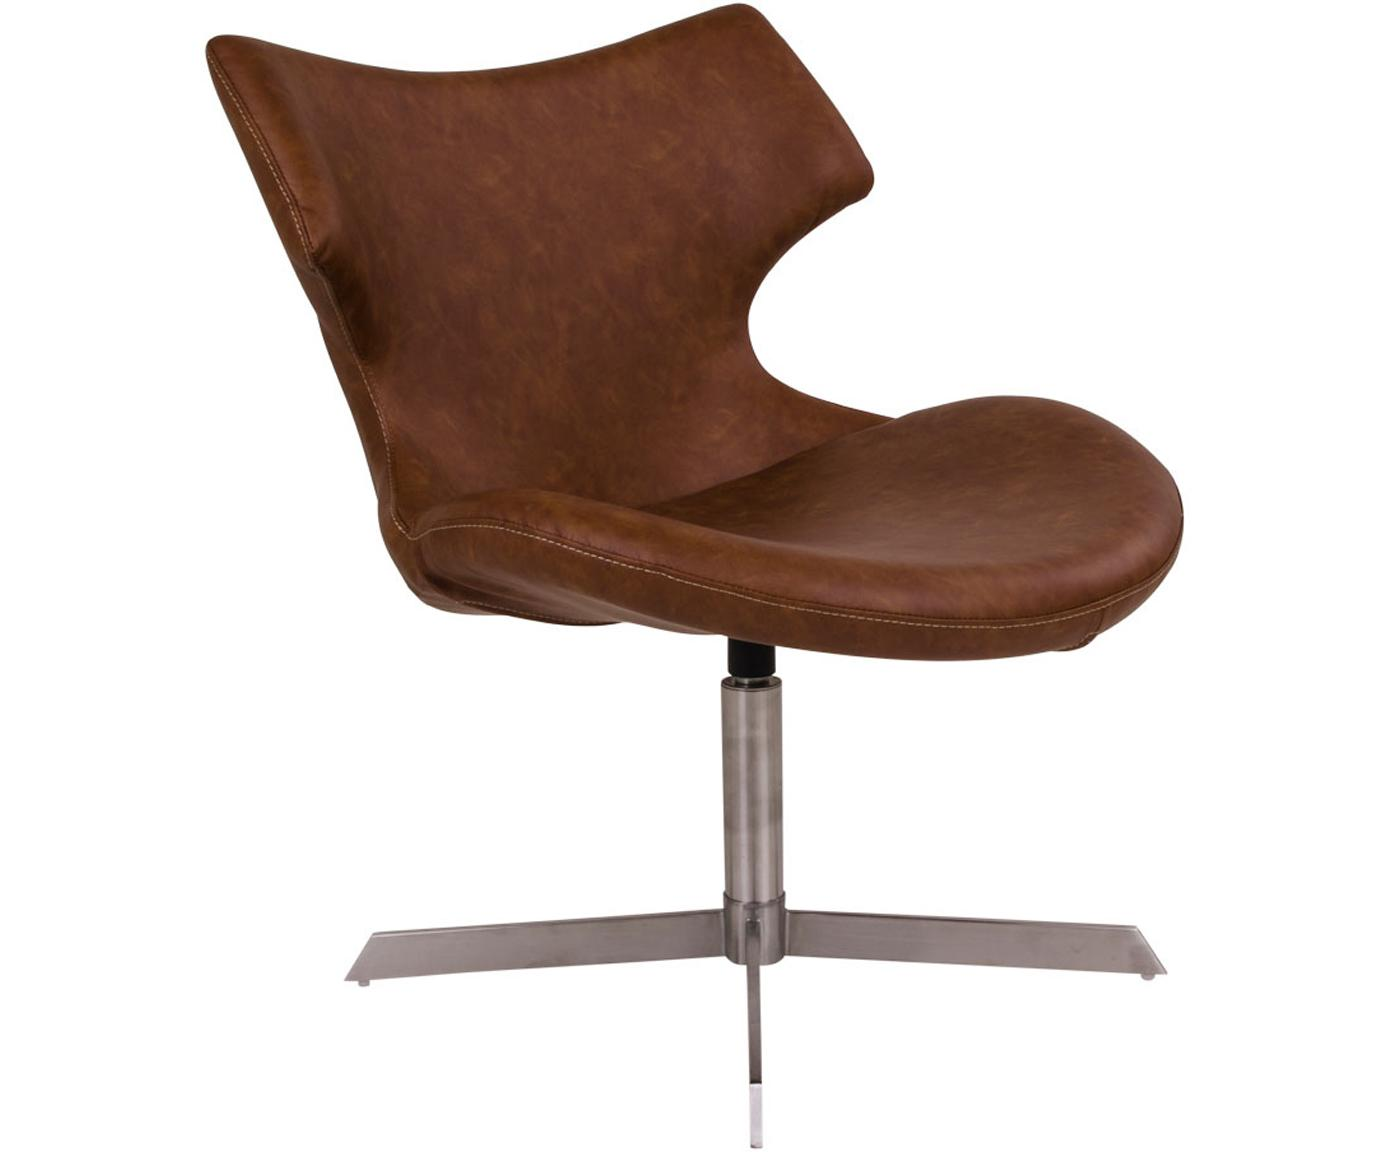 Silla giratoria en cuero sintético Zampi, Tapizado: cuero sintético, Estructura: acero, Marrón, acero, An 70 x F 65 cm